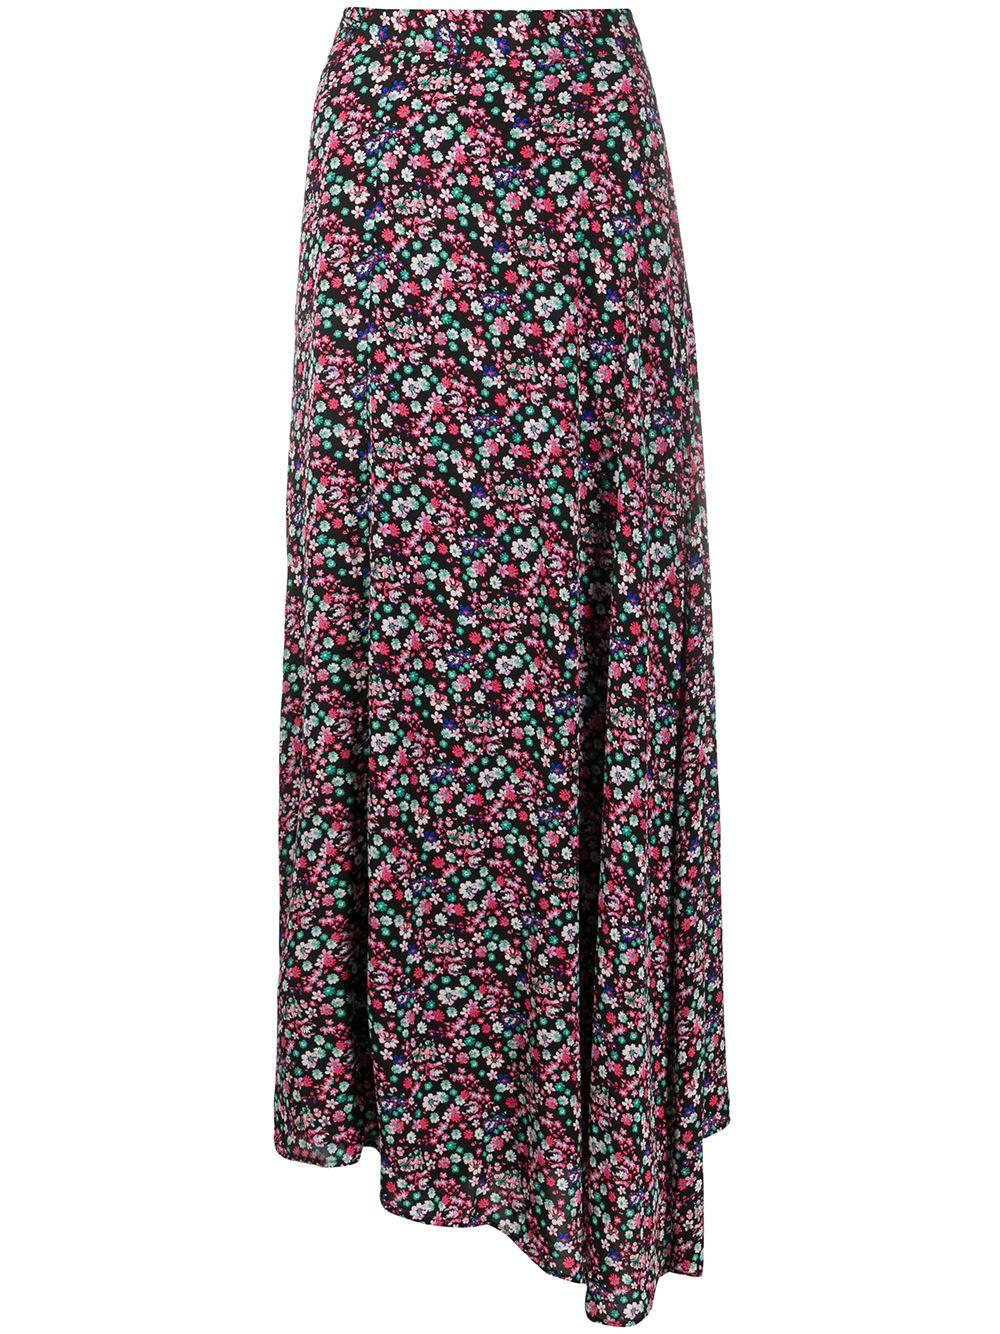 Essentiel Antwerp floral print wrap skirt